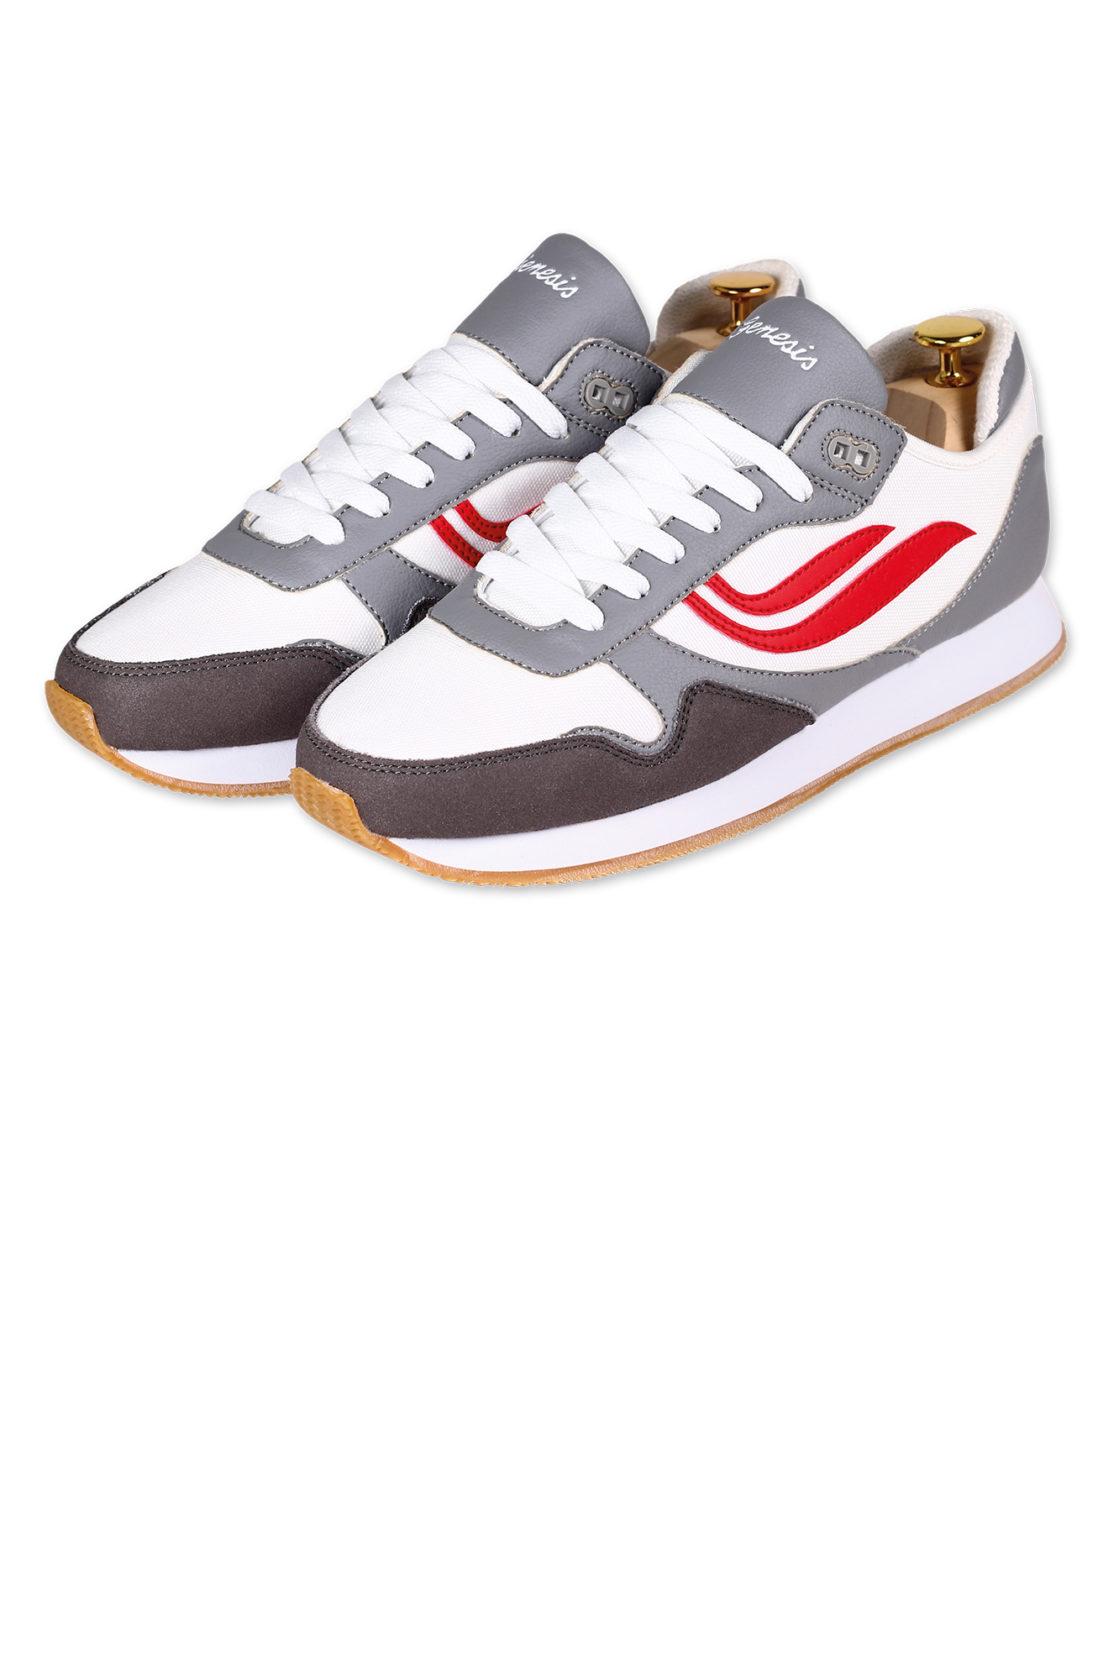 Genesis | Sneaker Iduna grey/ white/ red - vegan